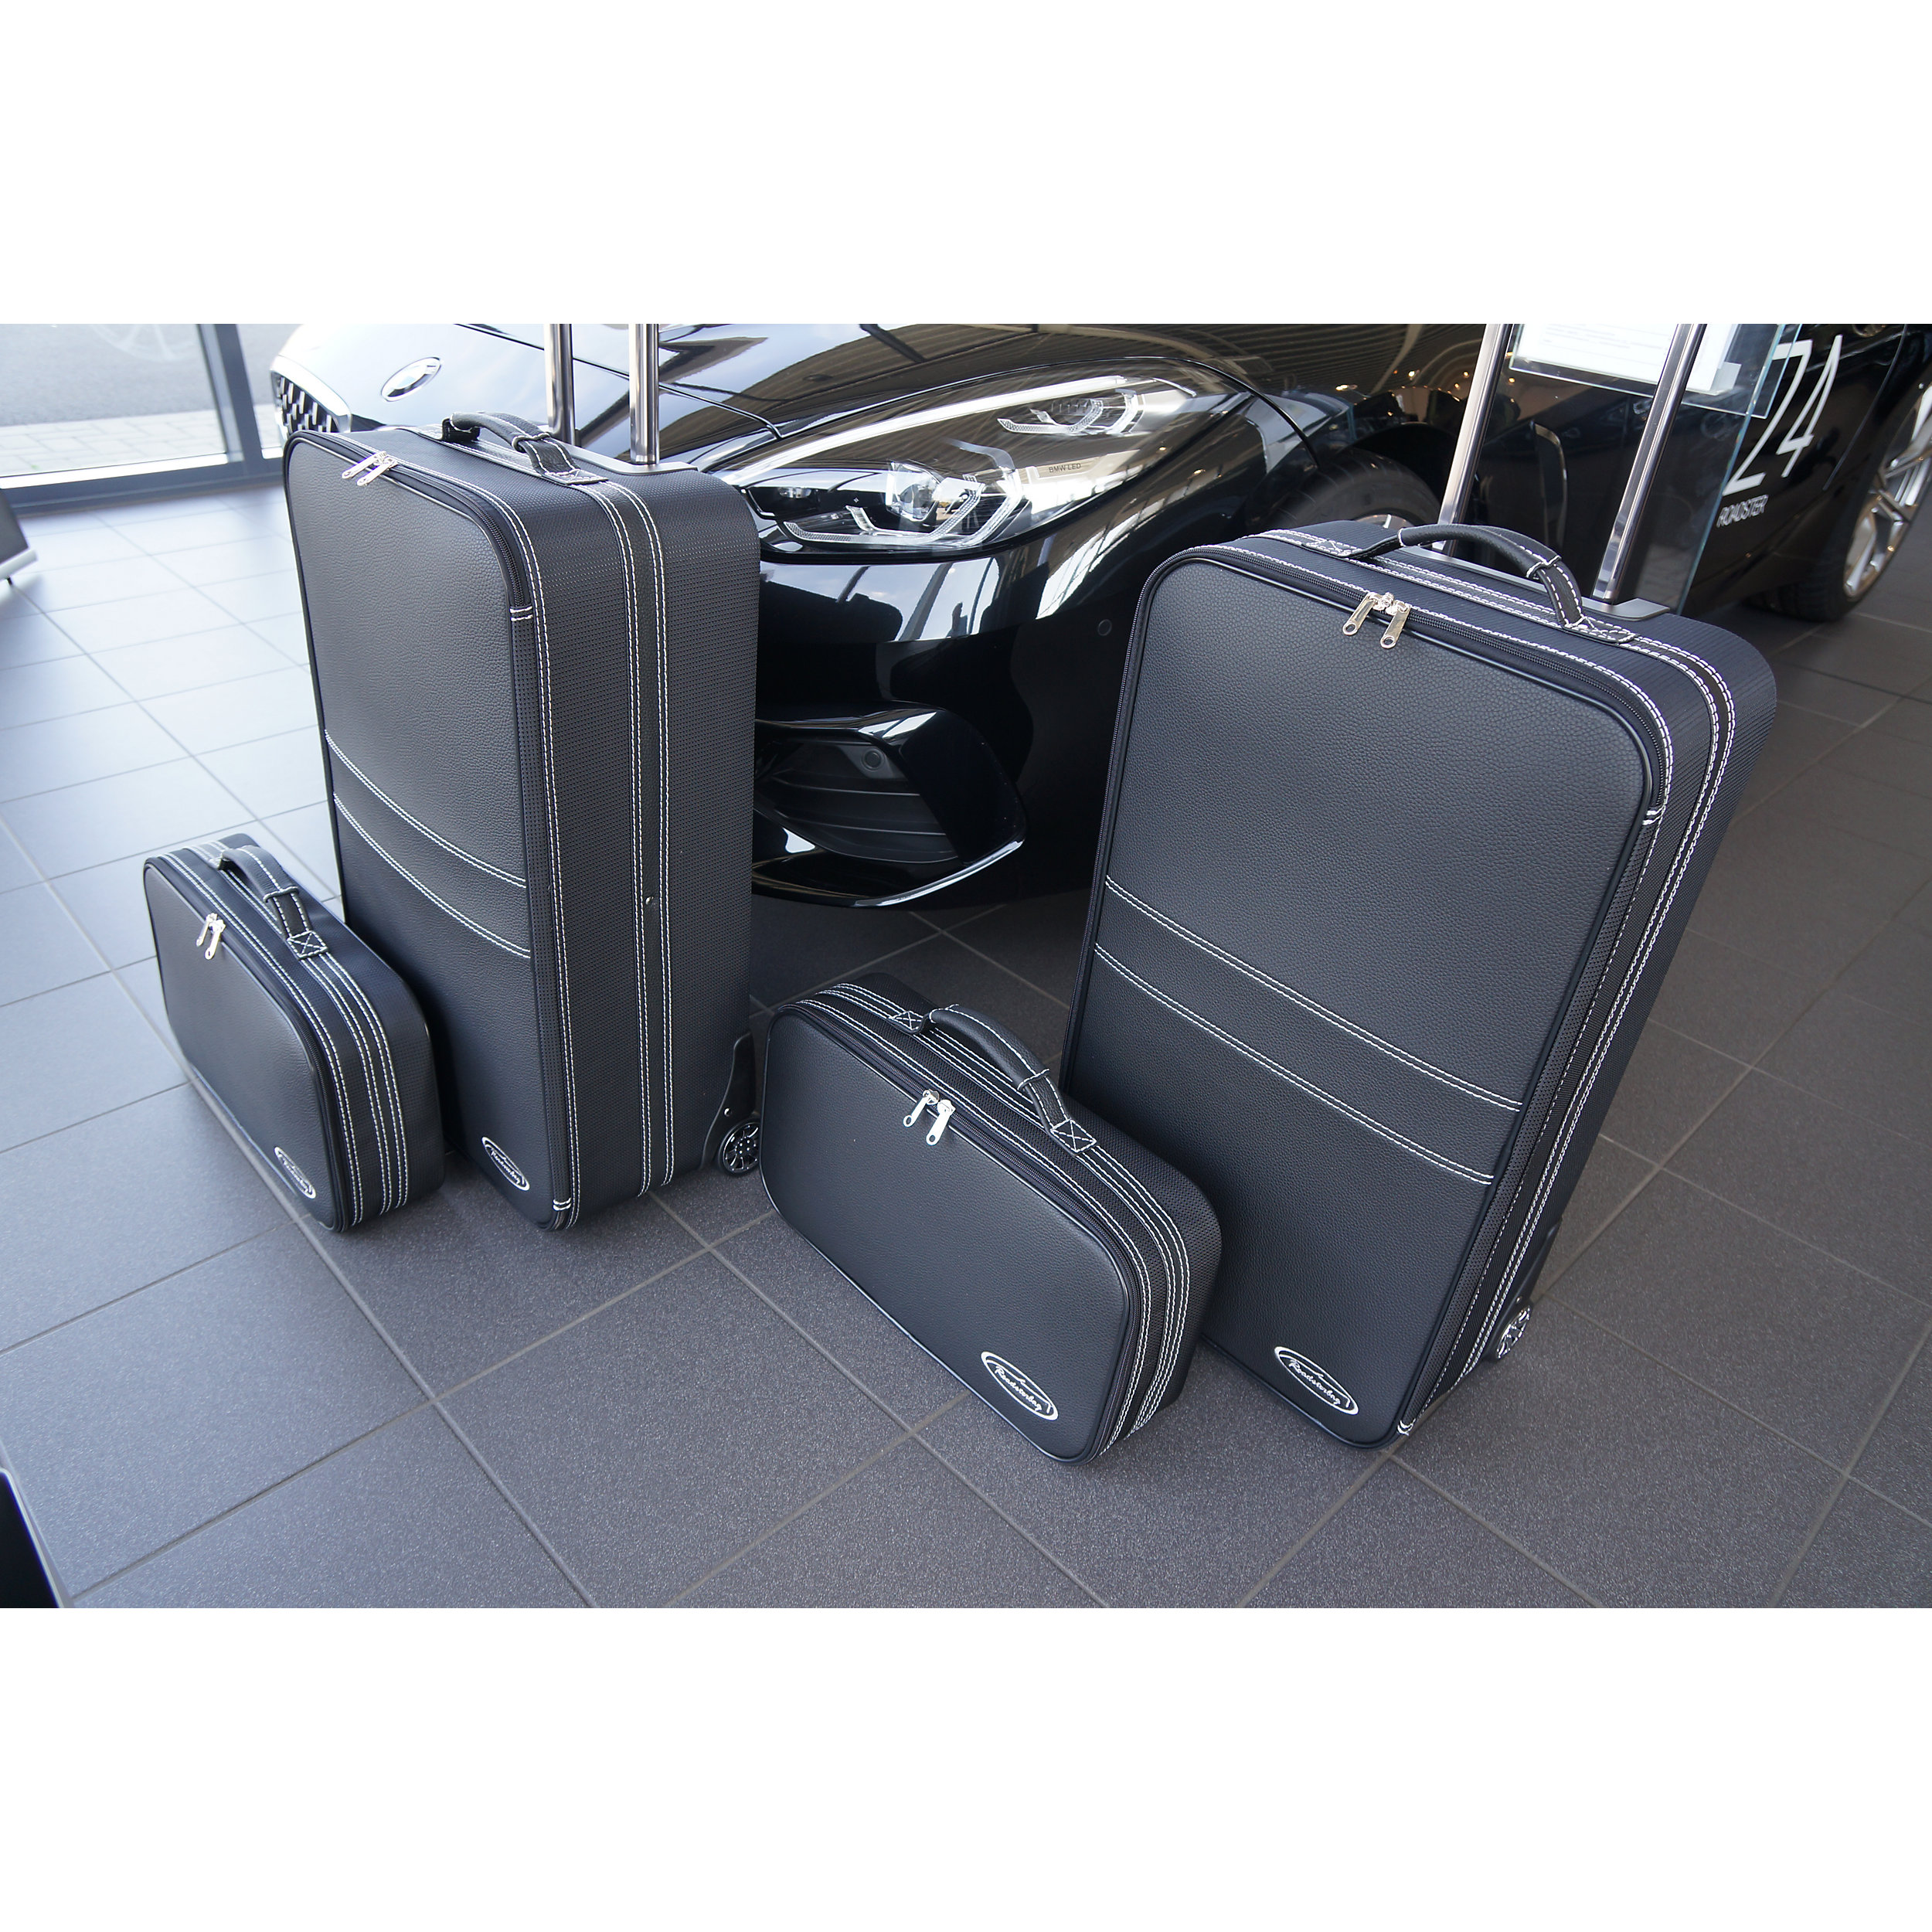 4-part Luggage Set with 2 wheels BMW Z4 (G29) 180 Liter